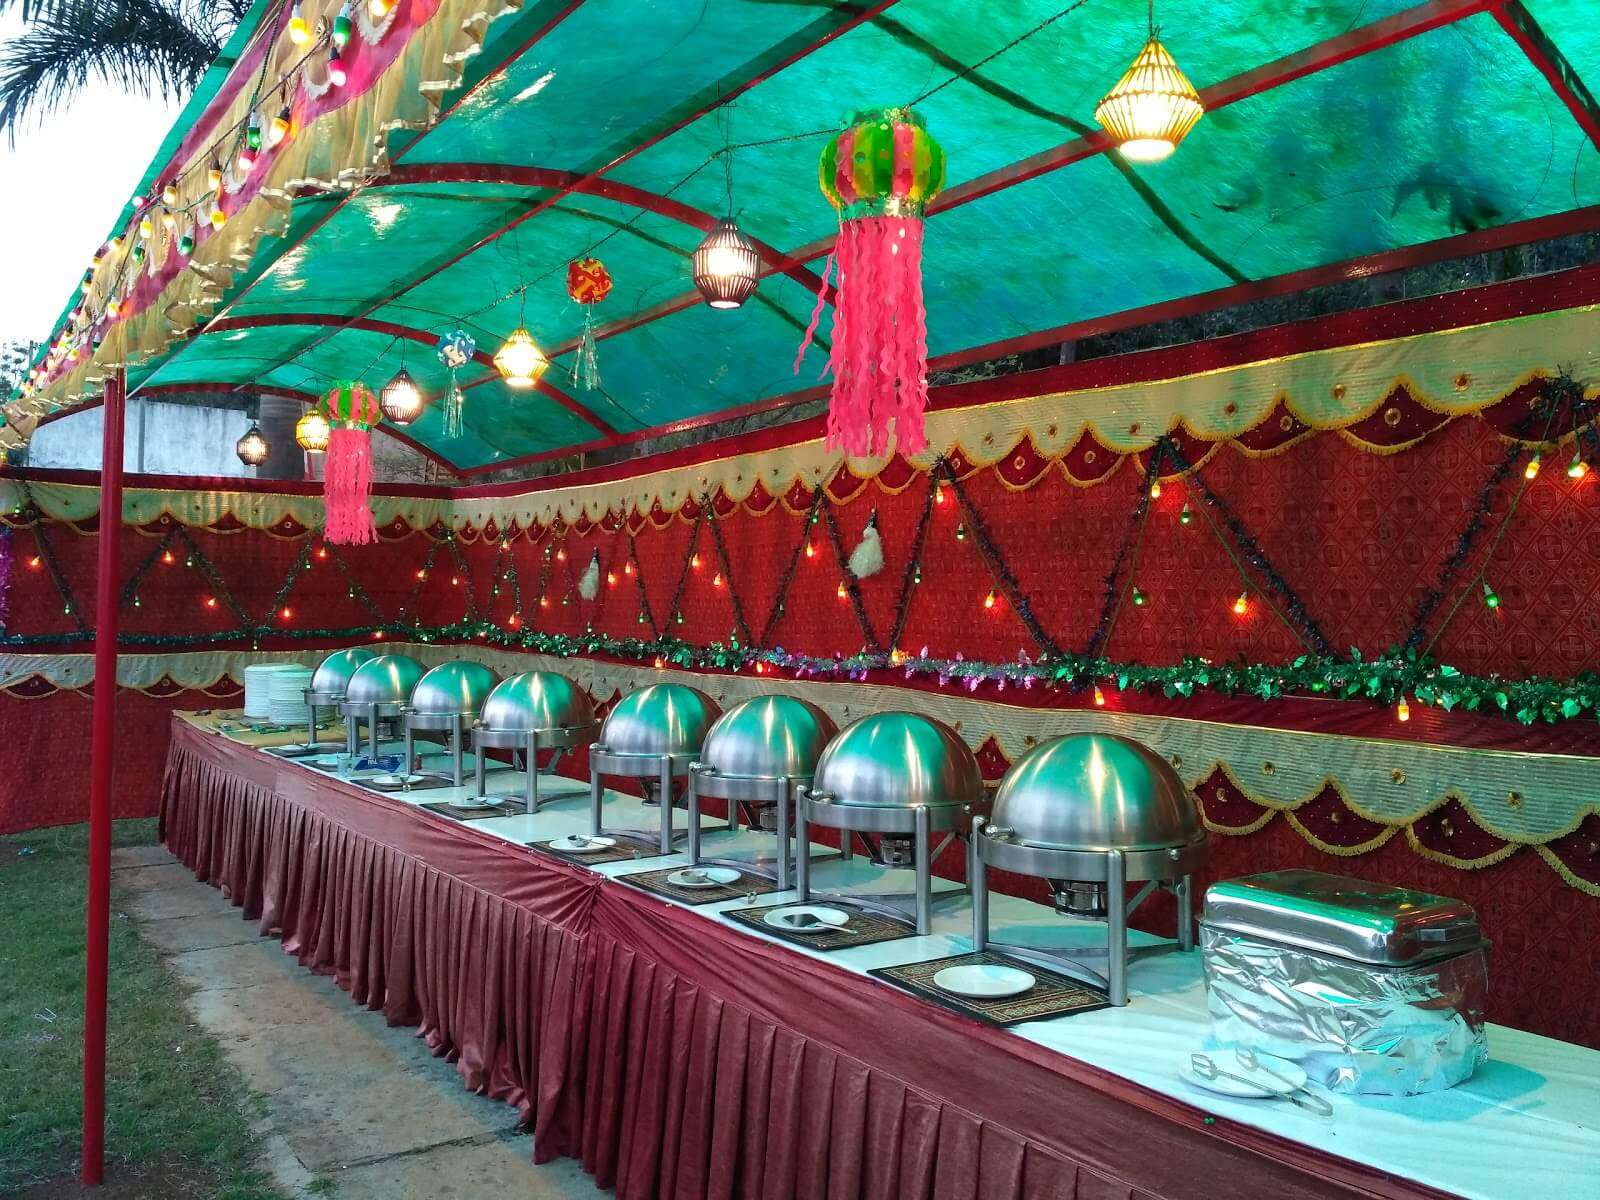 buffet at a resort in Saputara